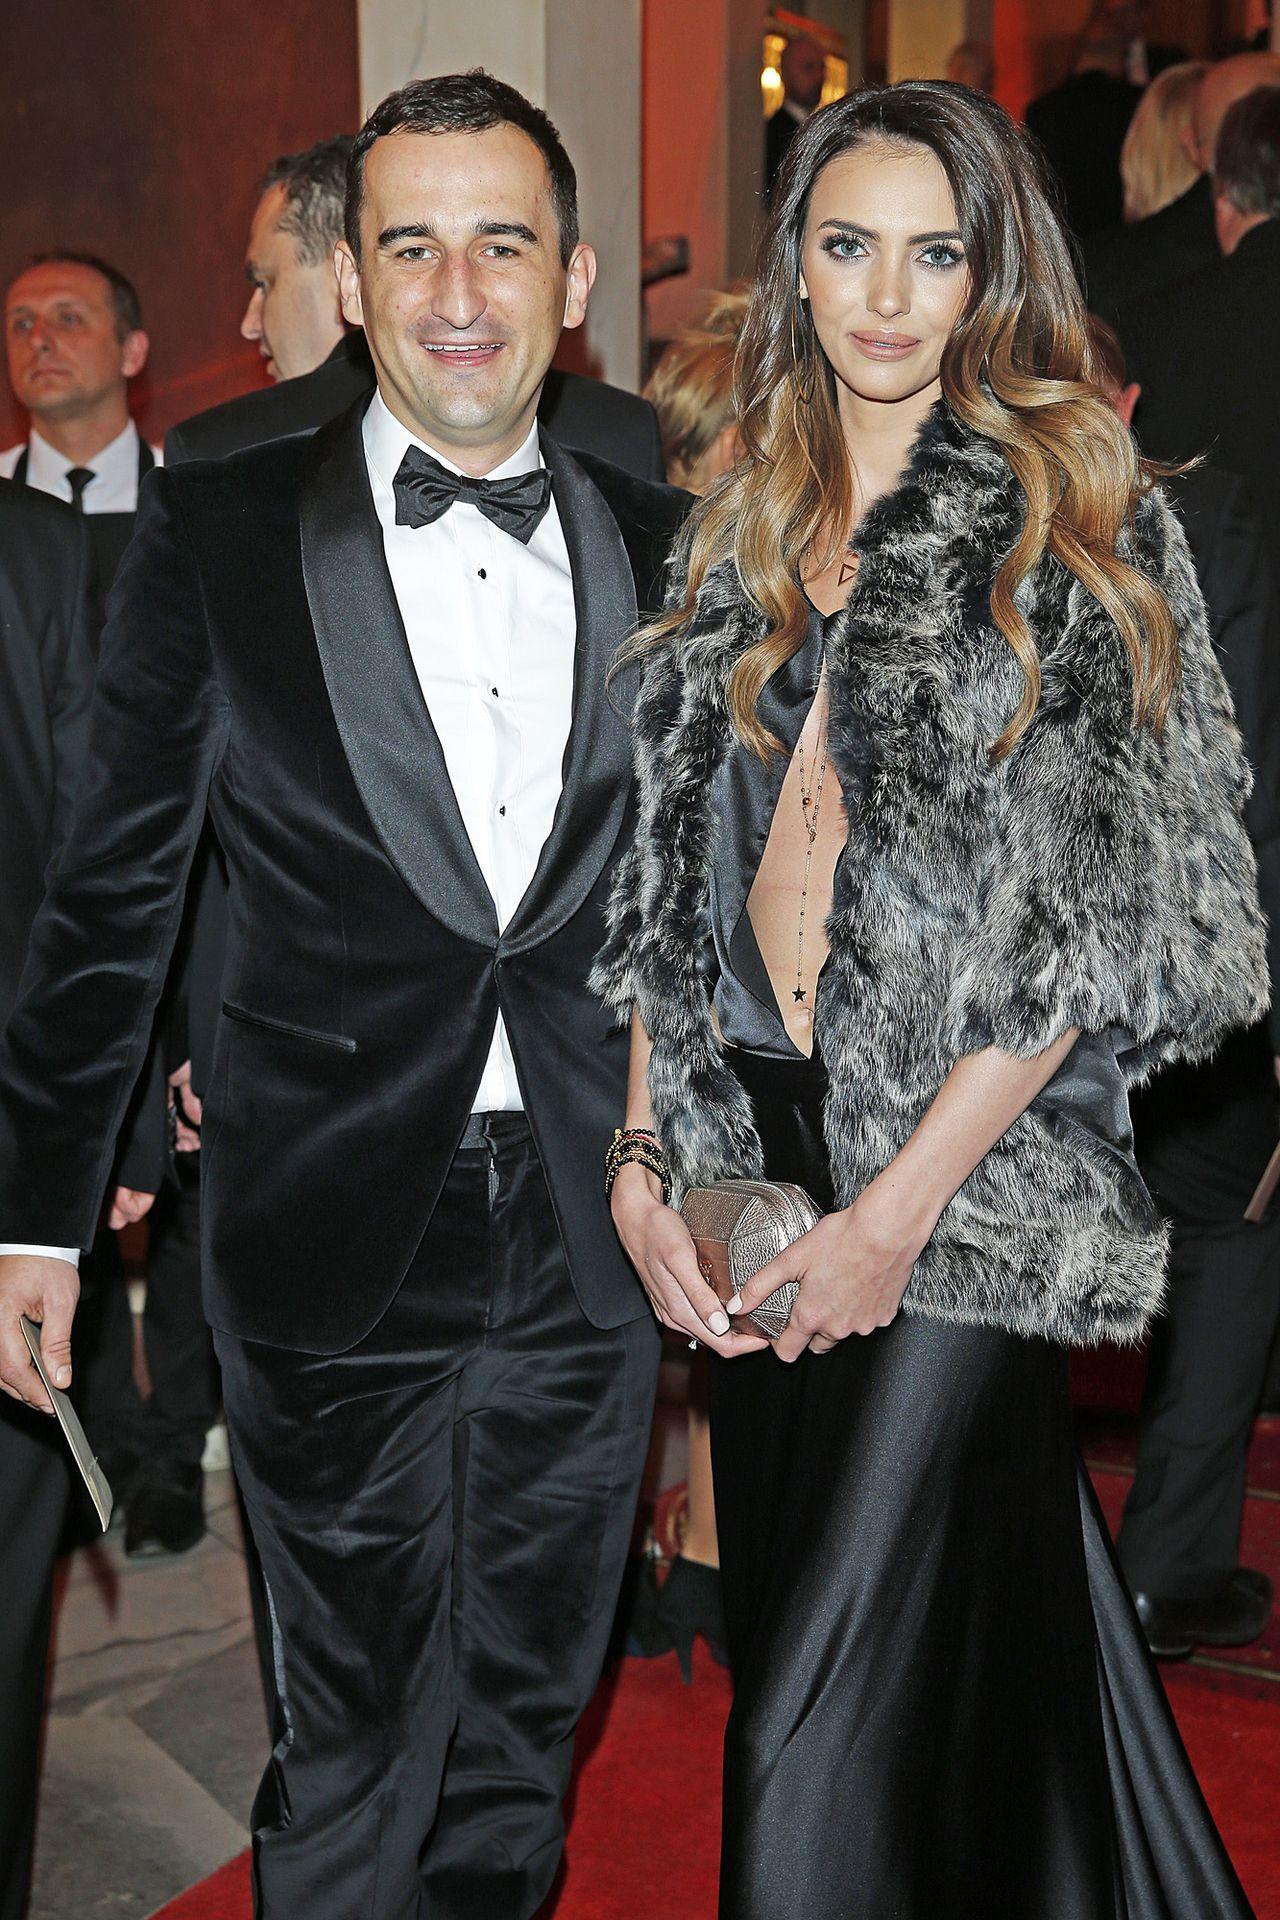 Marcela Leszczak i Misiek Koterski – najsłodsza para Pollywood